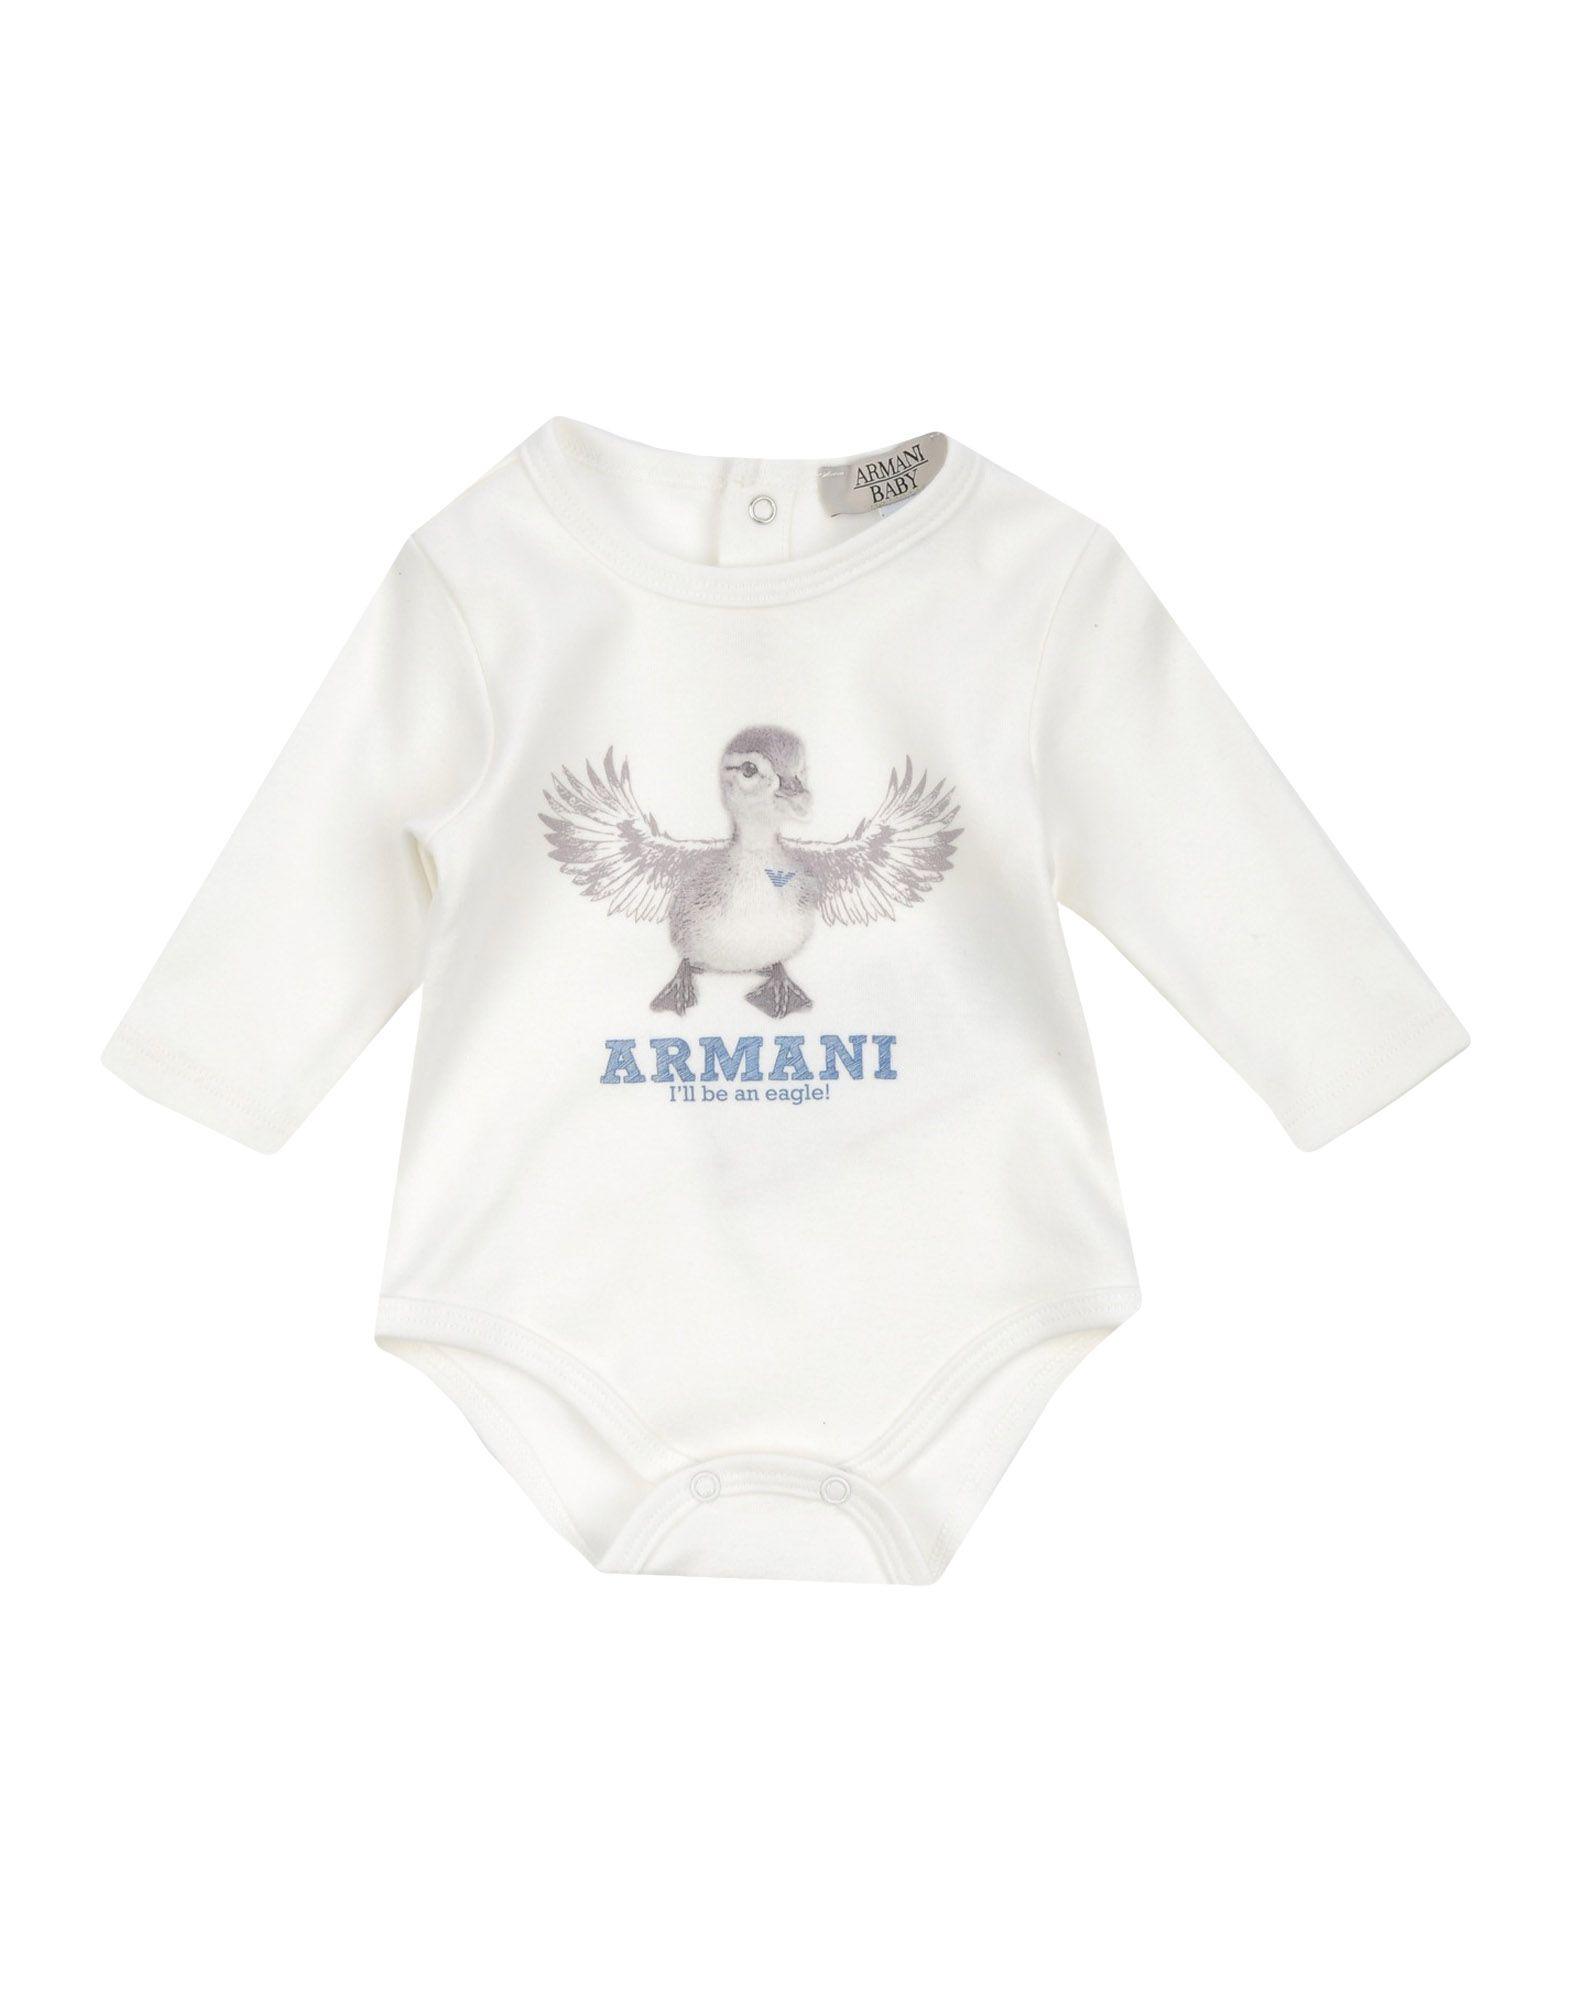 ARMANI BABY Bodysuits